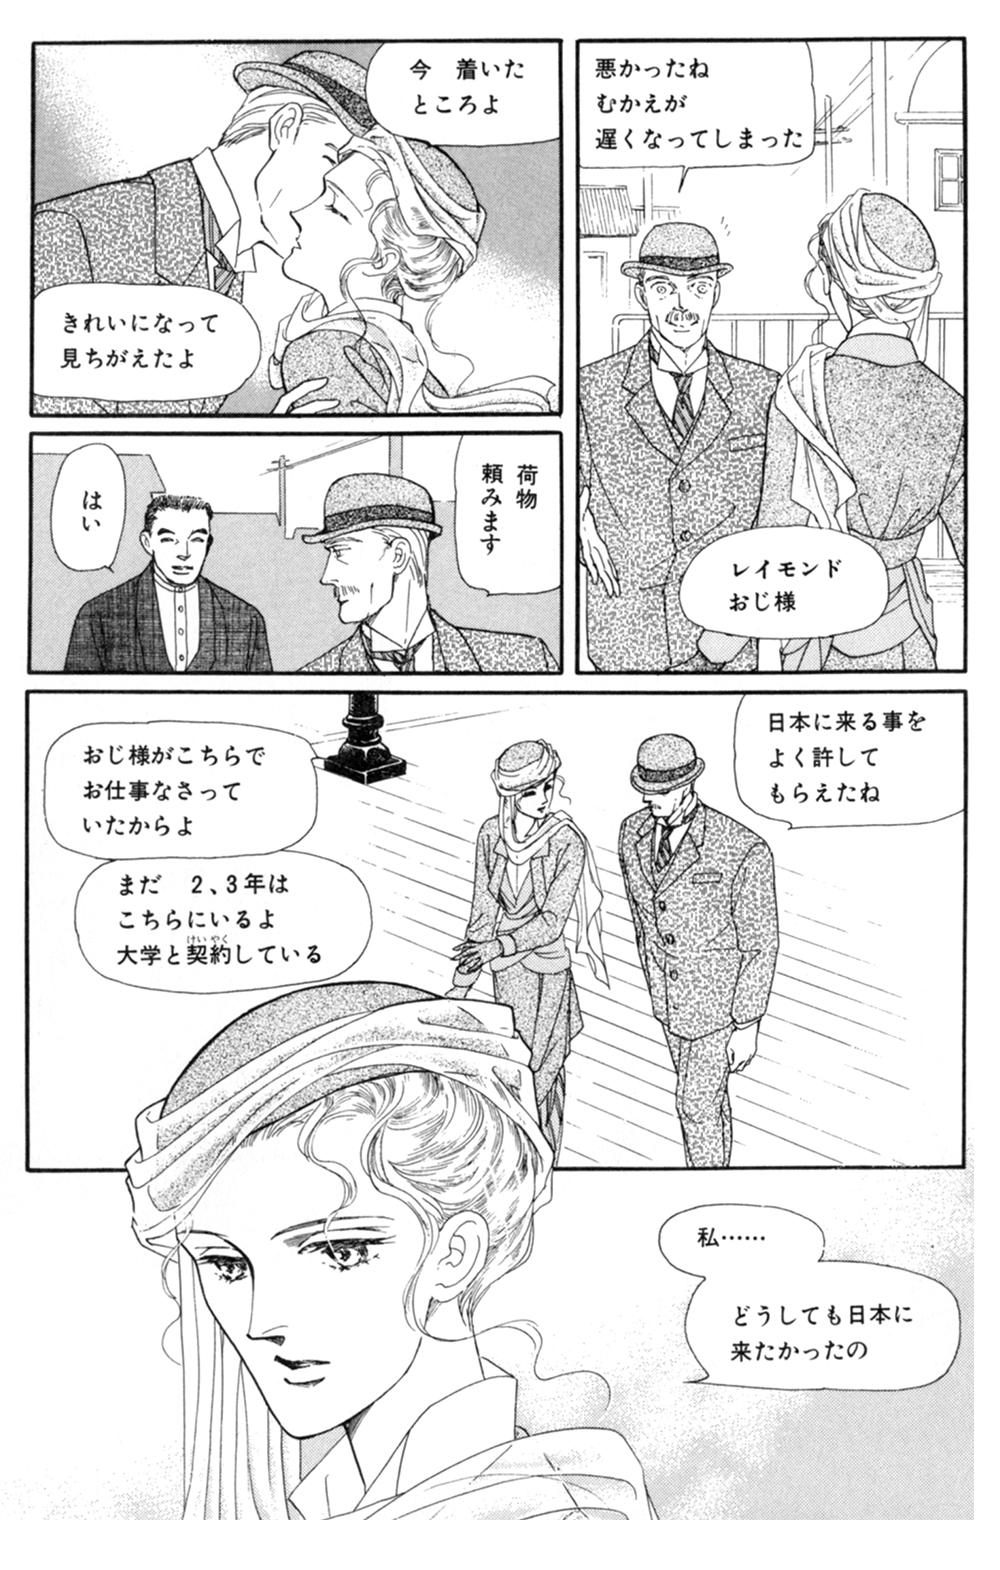 雨柳堂夢咄 第7話「金色の鶏」①uryudo-04-171.jpg